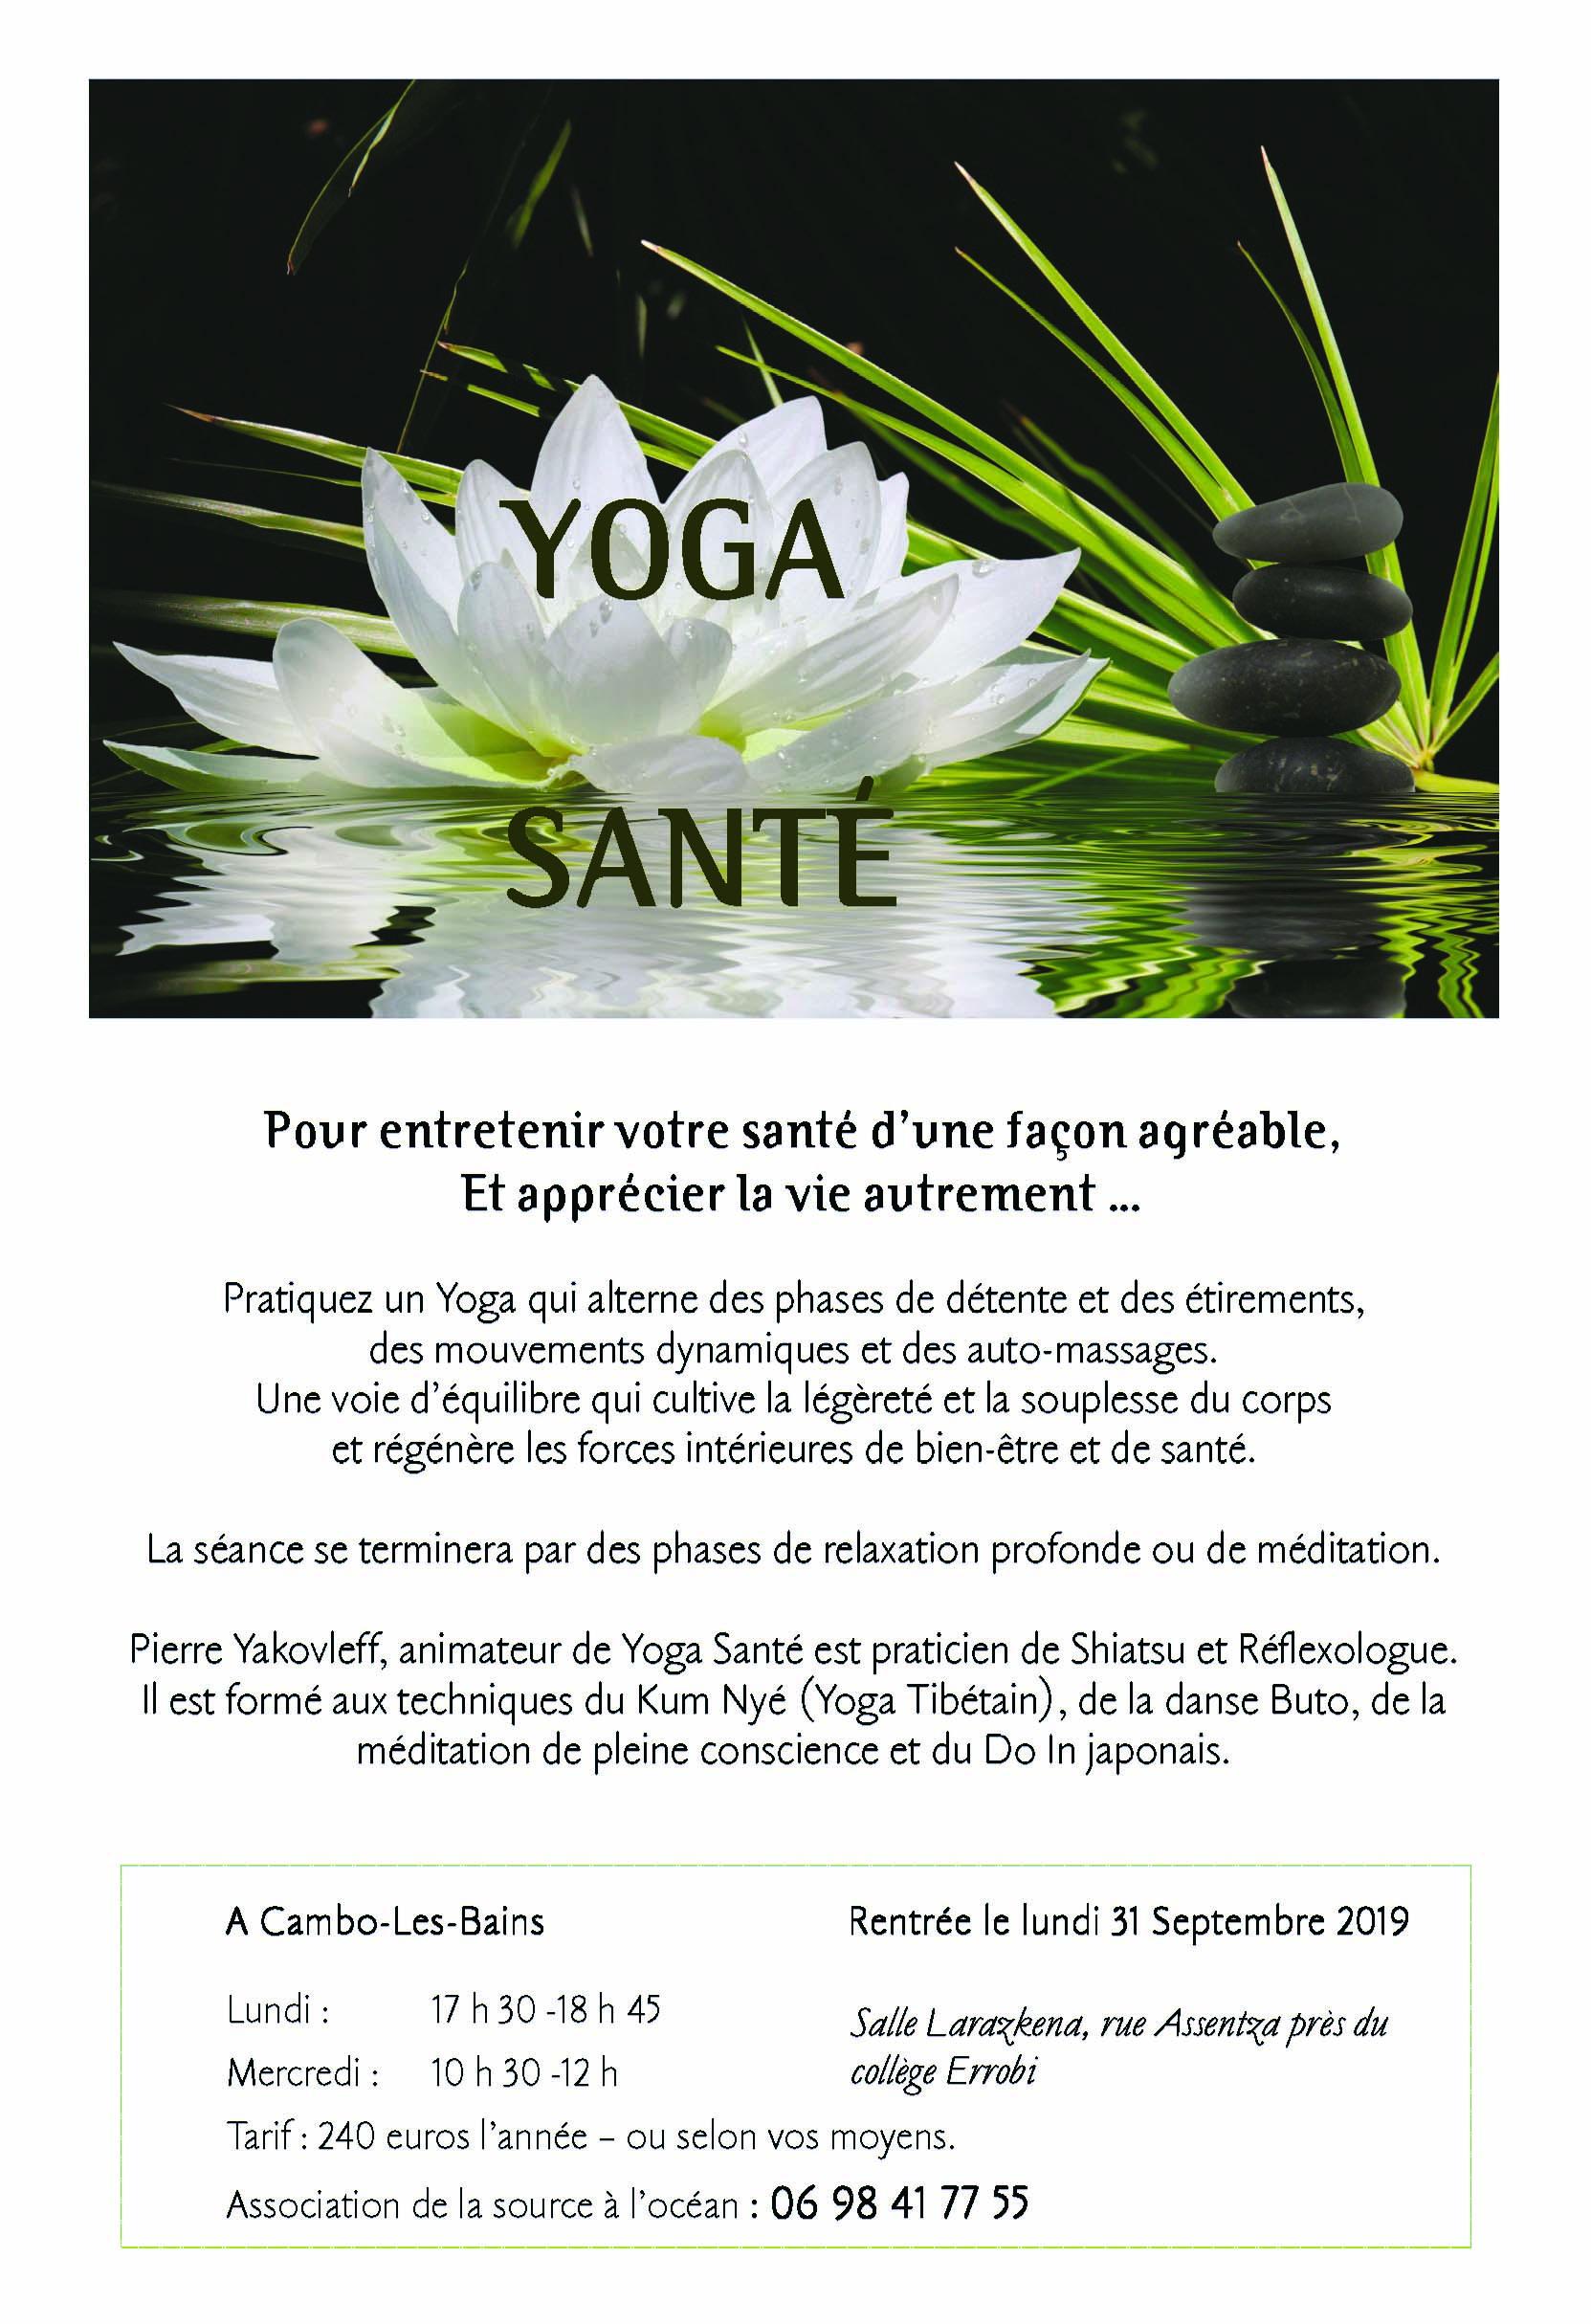 Yoga Sante Cambo Les Bains